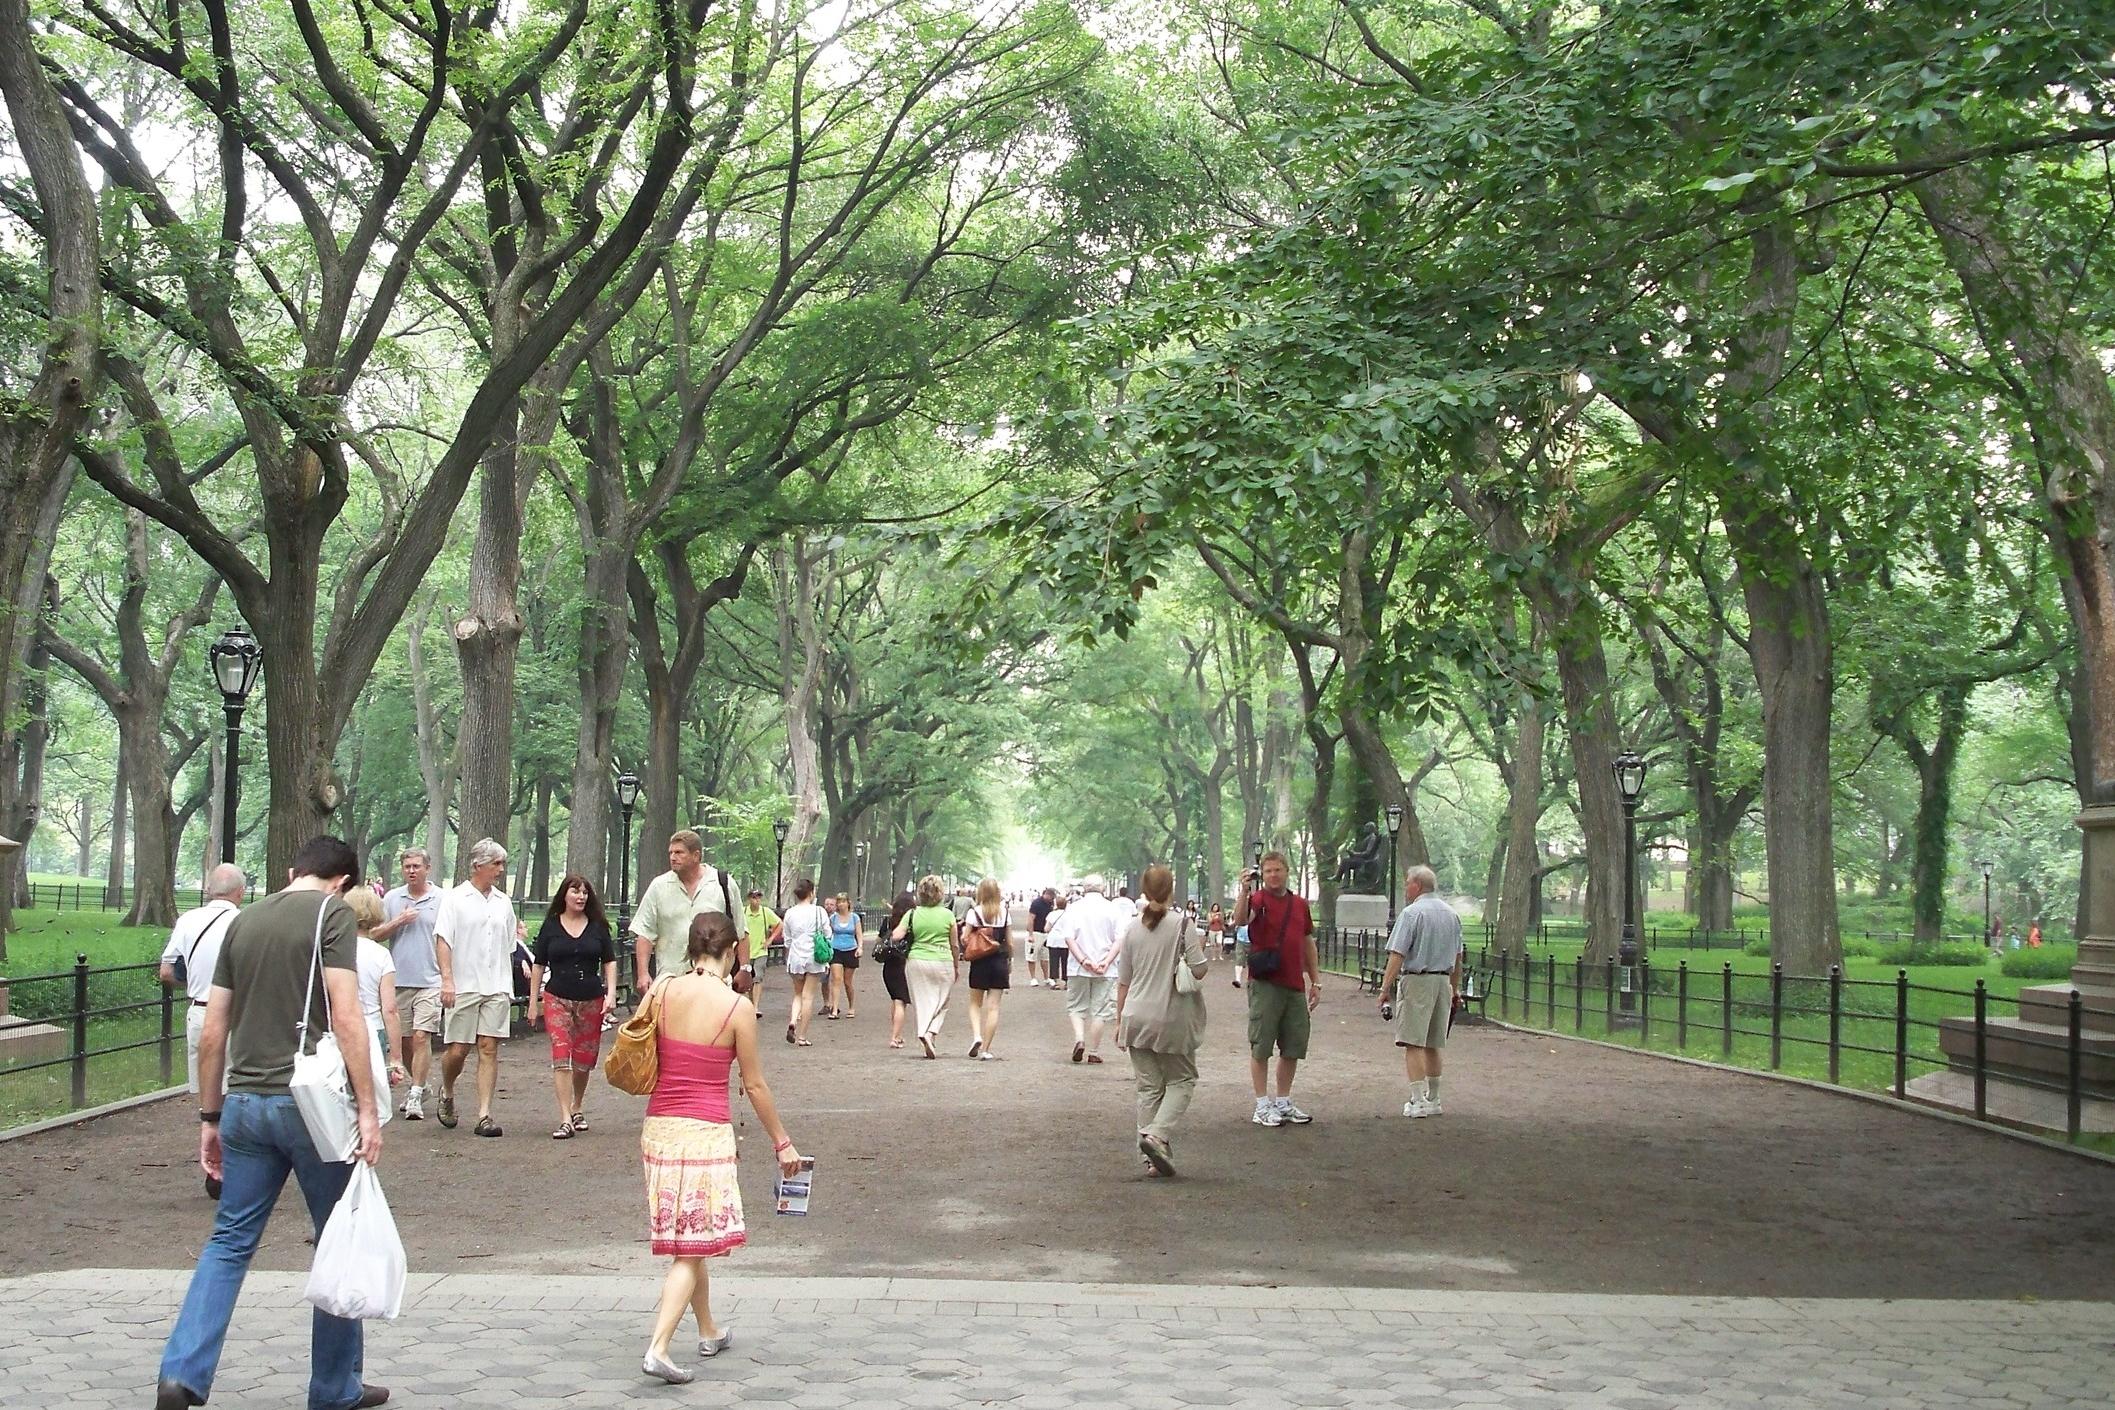 The_Mall_&_Literary_Walk,_Central_Park,_Manhattan,_NYC.JPG